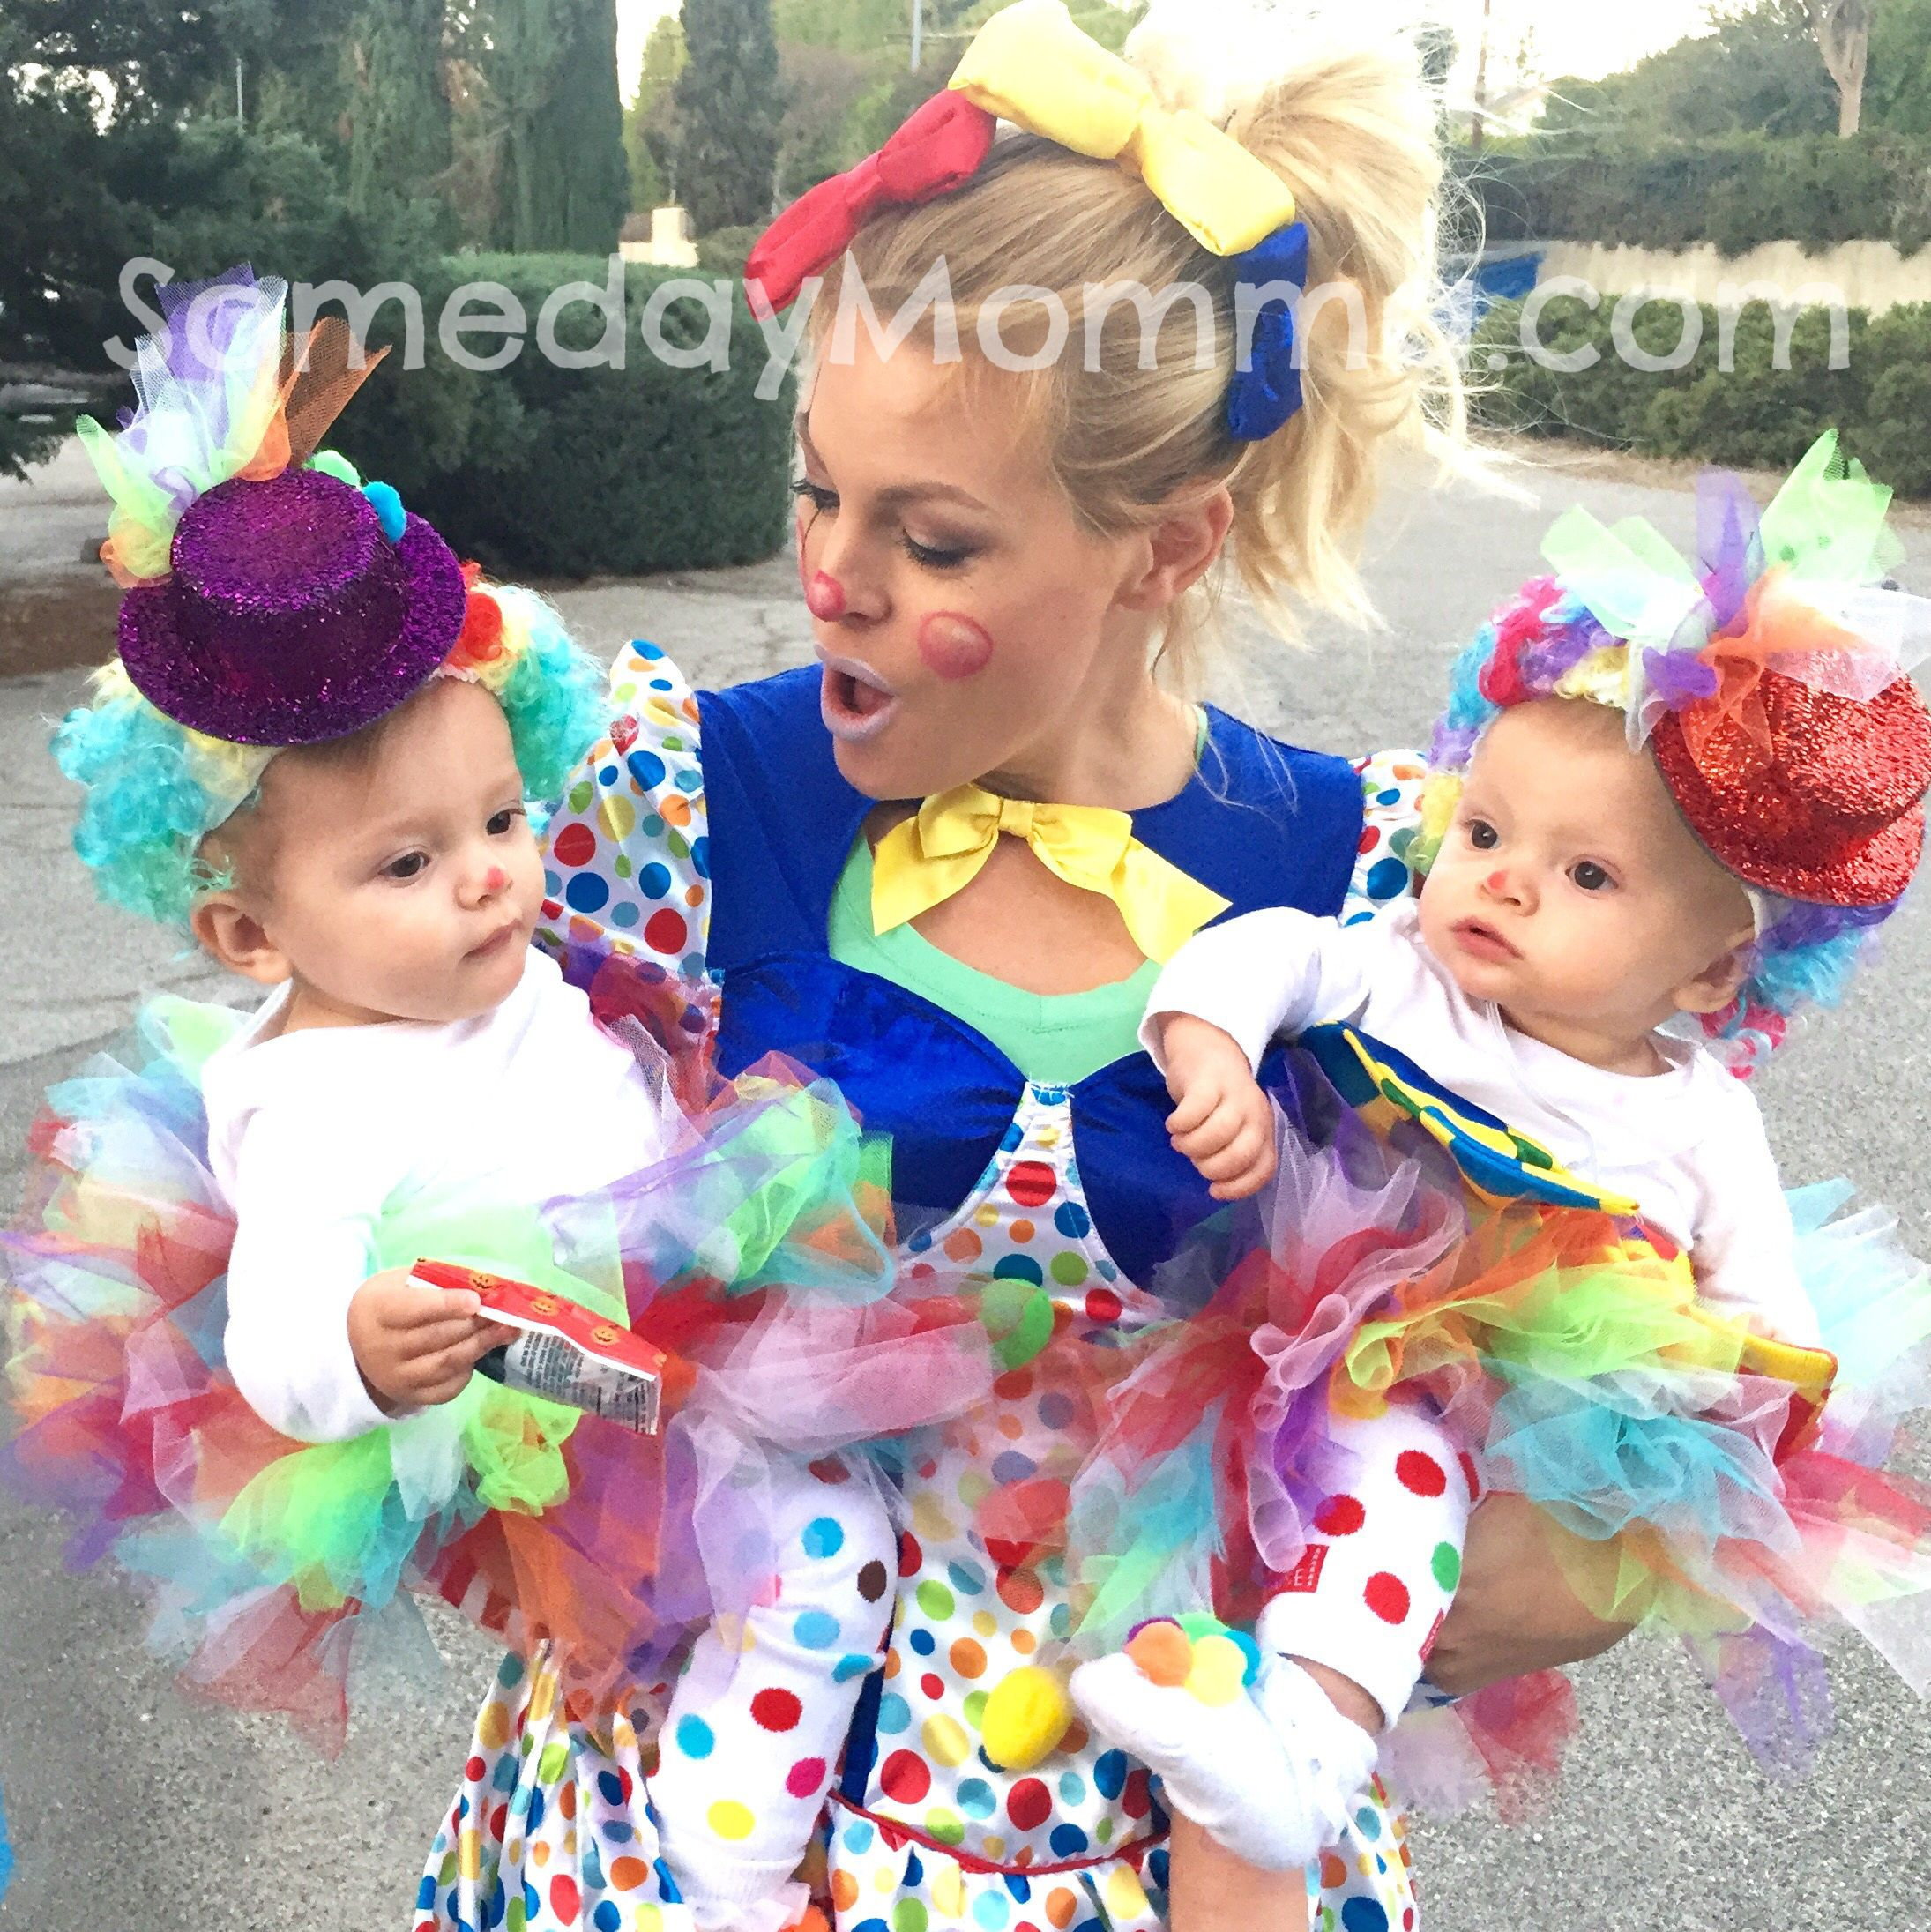 Cute clown family baby girls Halloween costume. DIY twins babys Halloween costume ideas  sc 1 st  Pinterest & Cute clown family baby girls Halloween costume. DIY twins babys ...